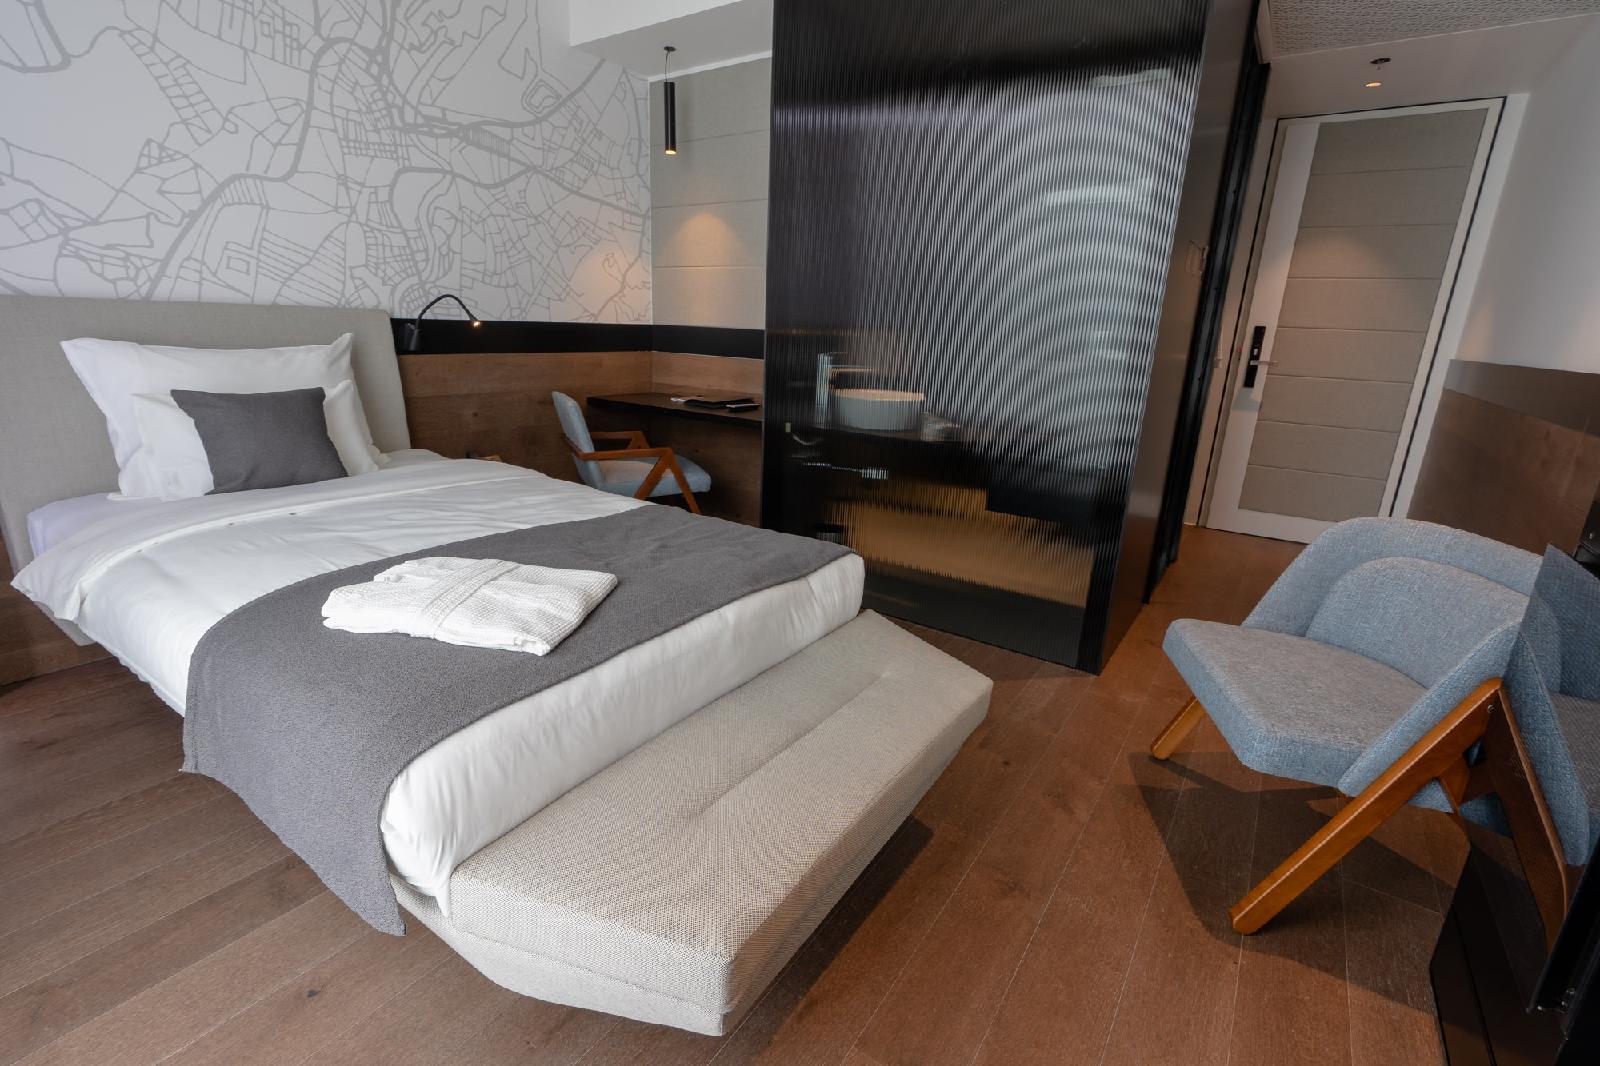 International Business Hotel Image 14